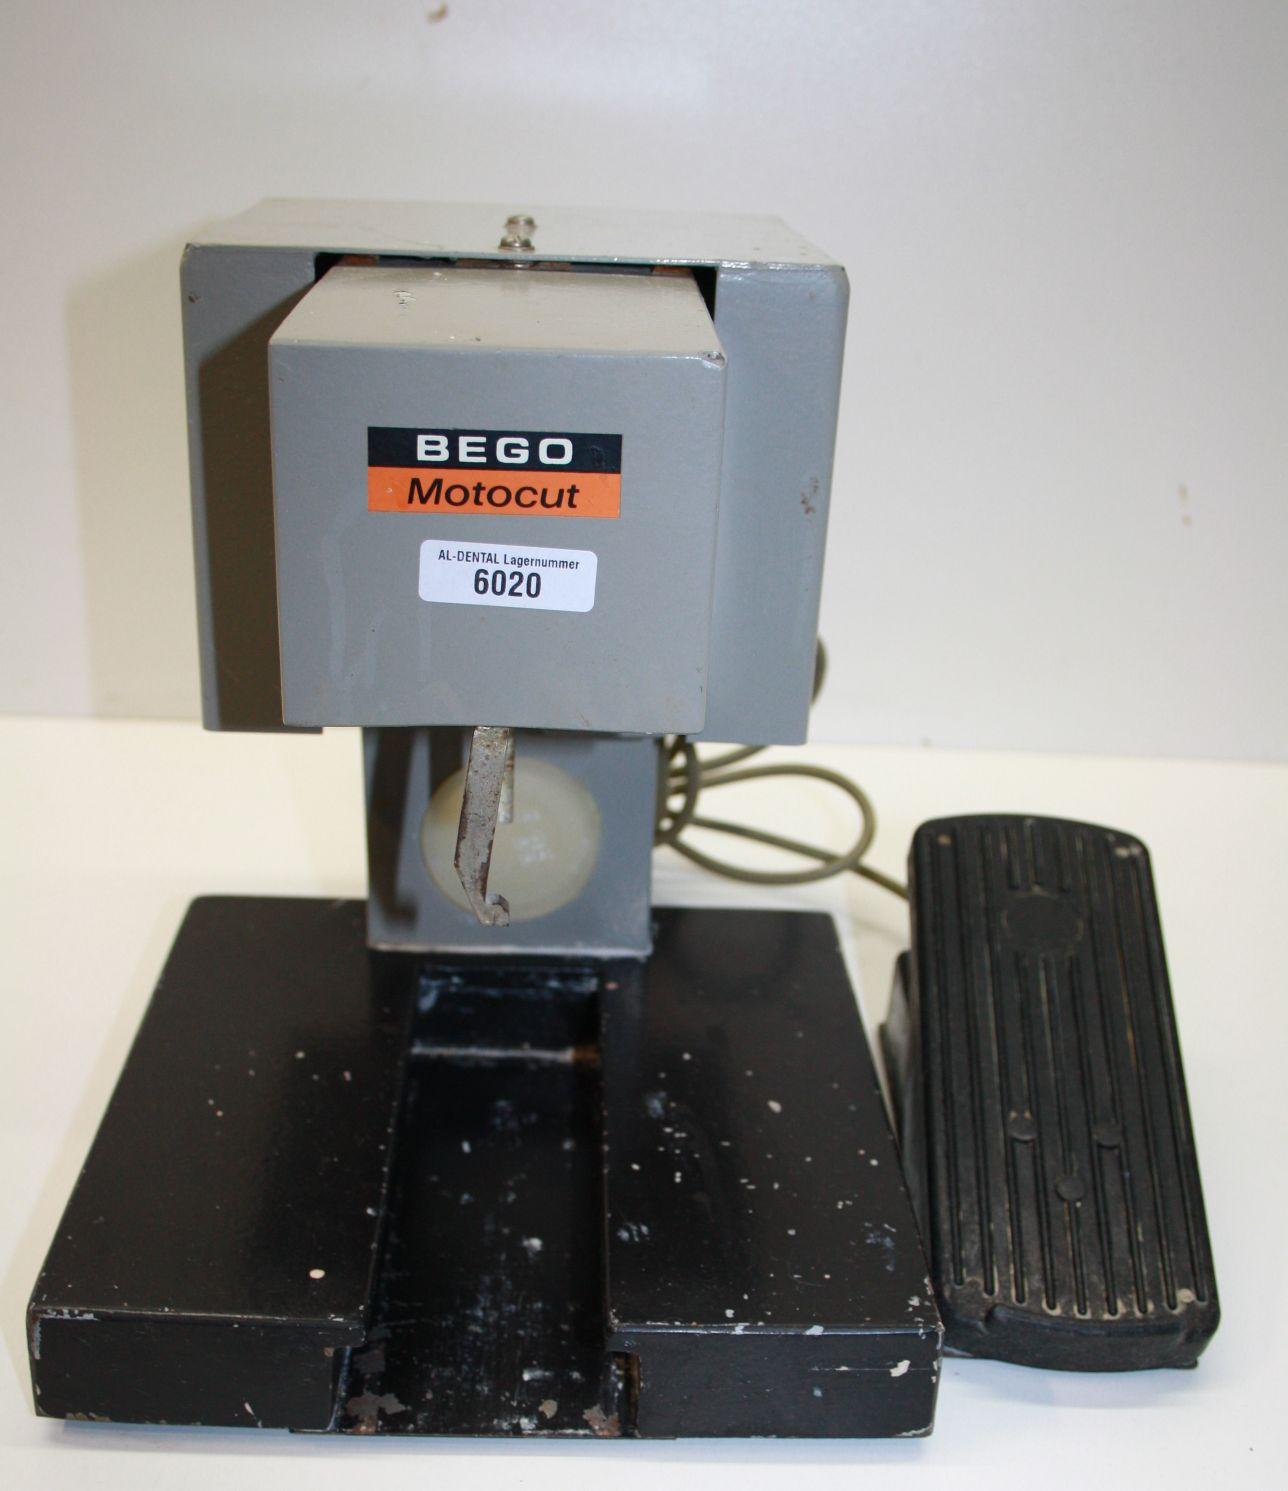 Modellsäge BEGO Motocut # 6020